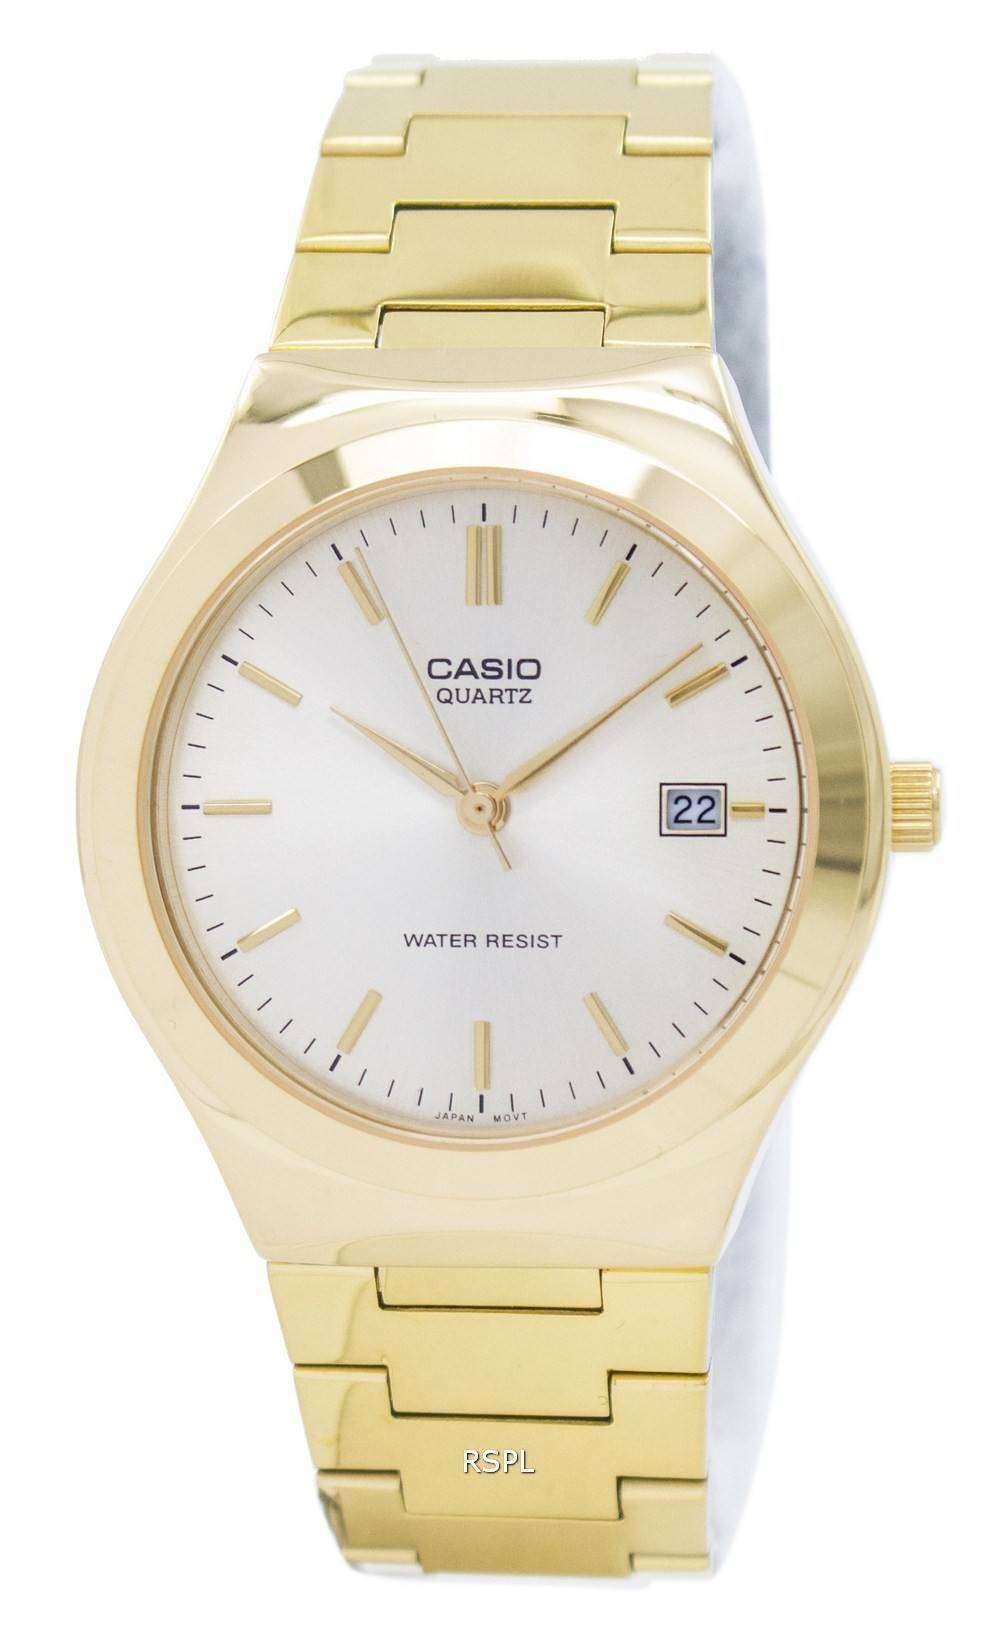 d6bf1e23d399 Reloj Casio cuarzo analógico dorado esfera MTP-1170N-9ARDF MTP-1170N ...